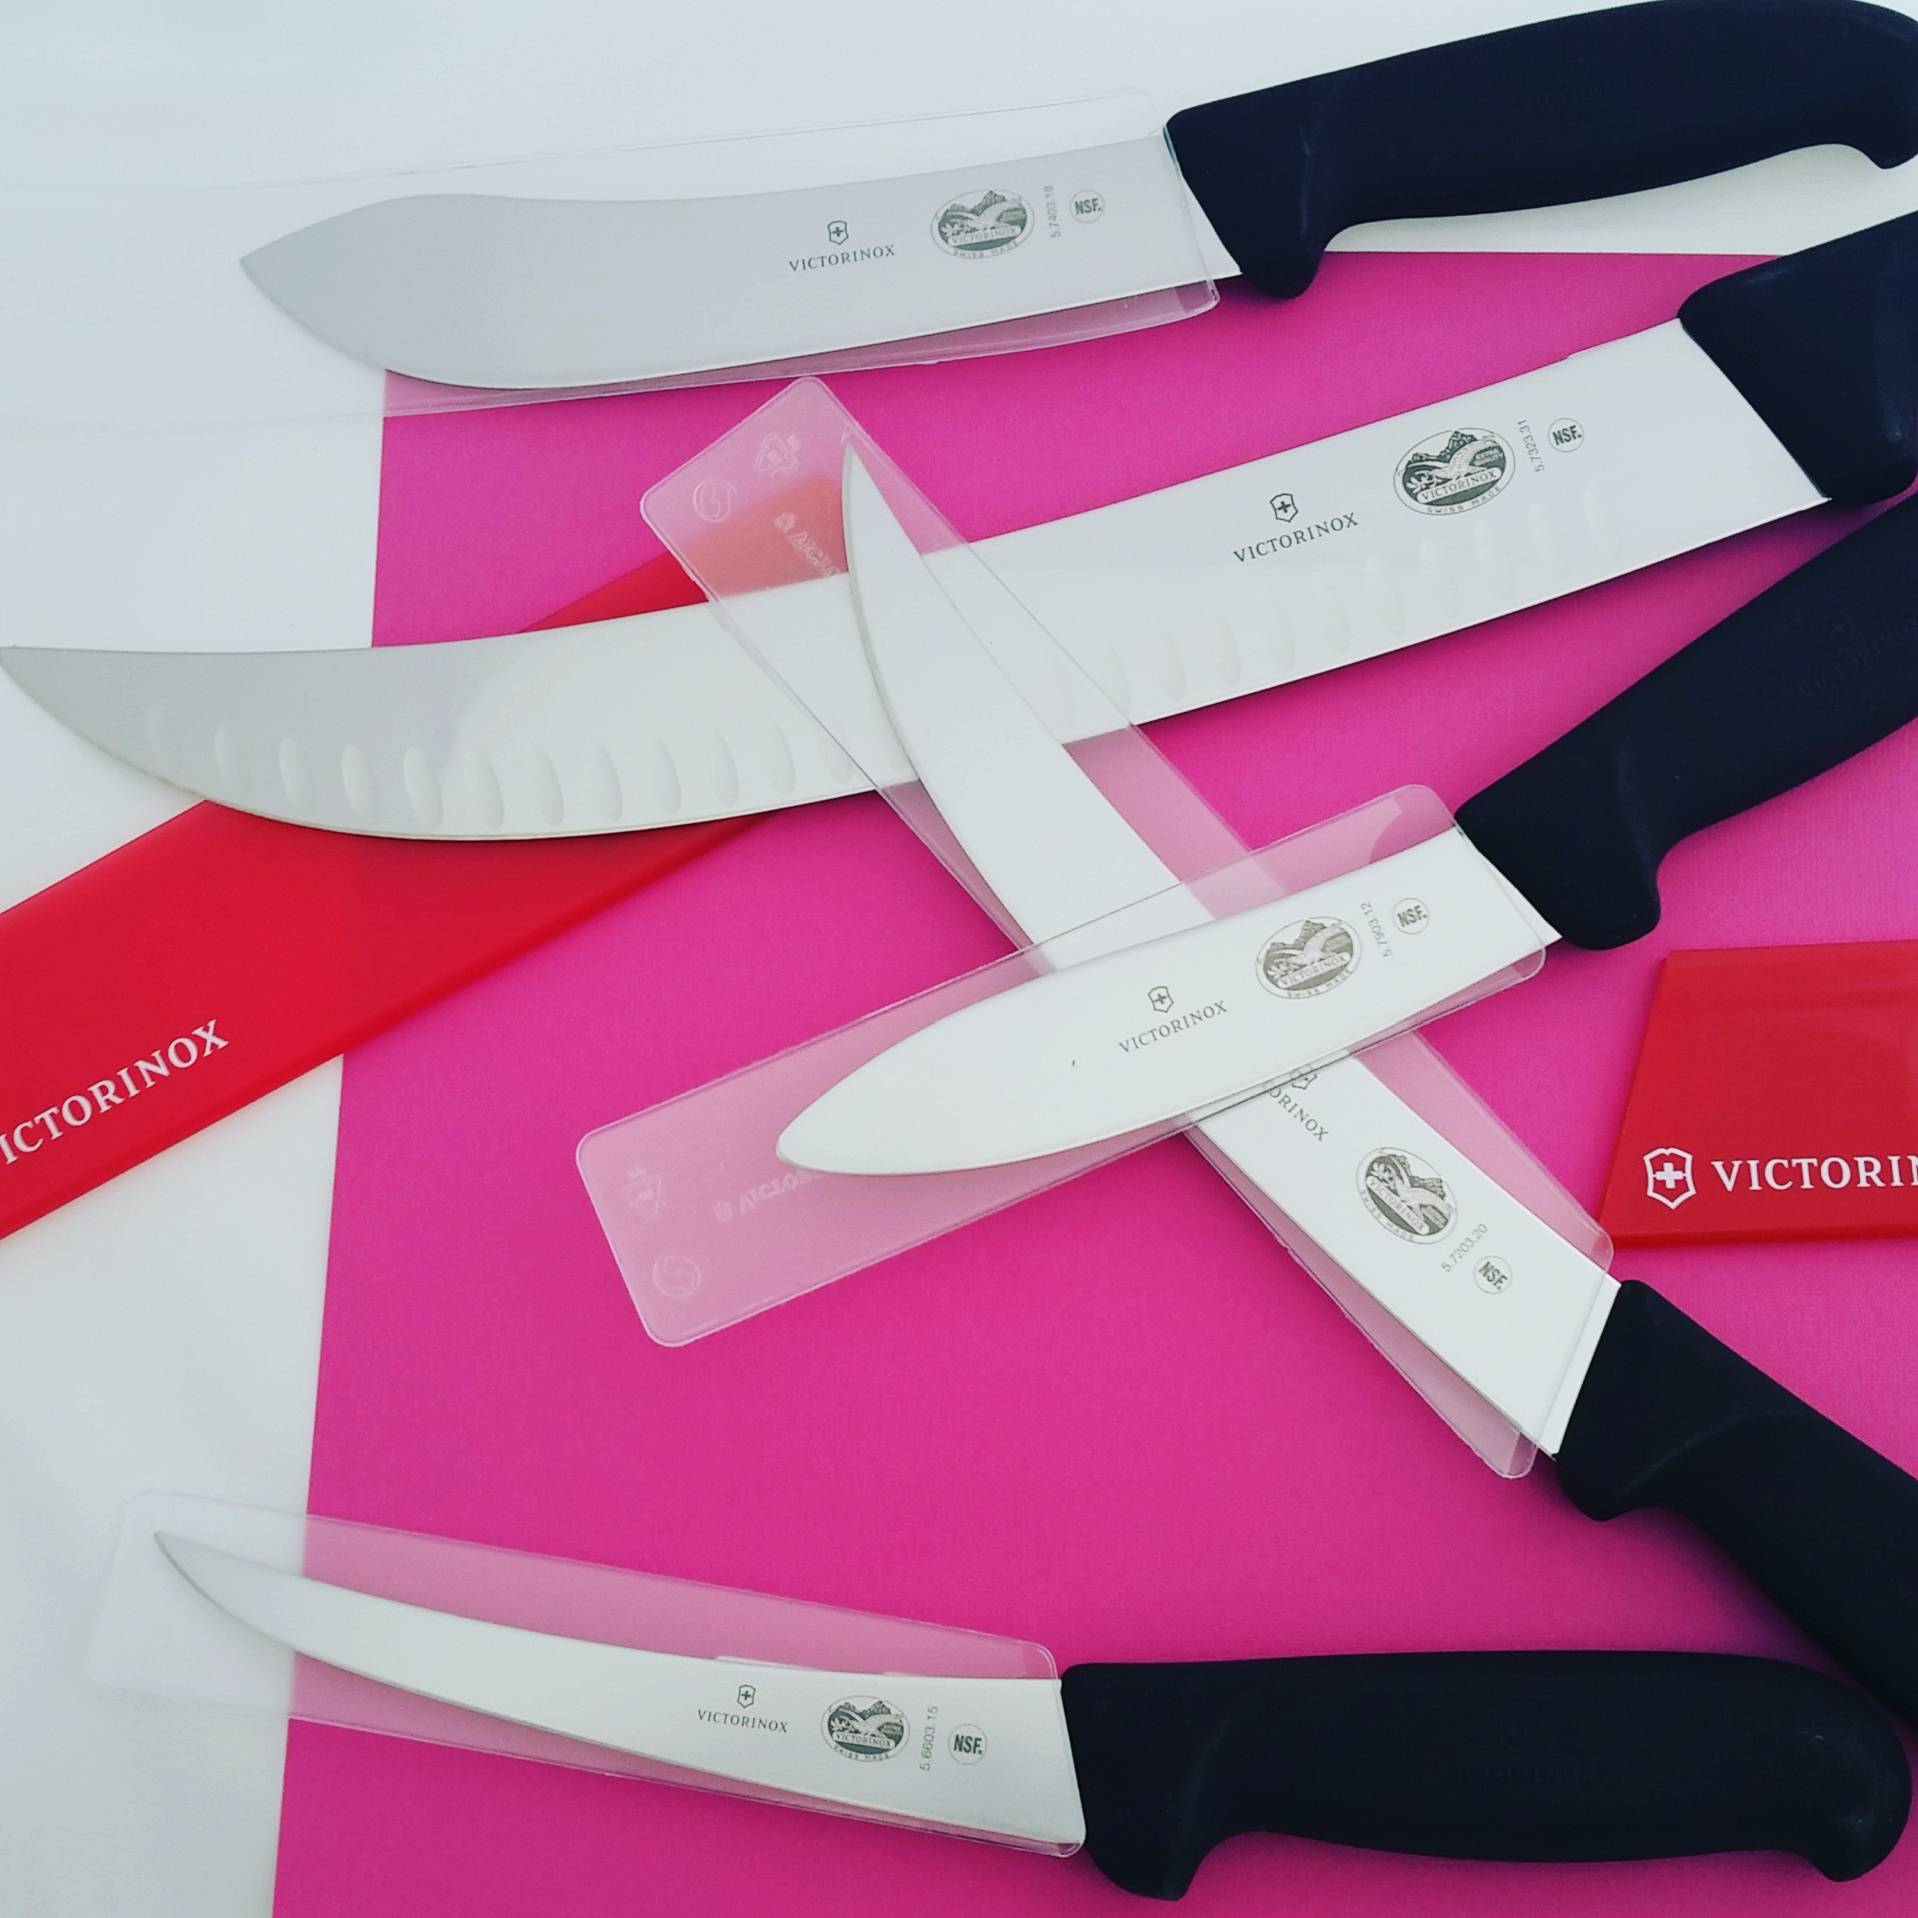 New Victorinox shipment